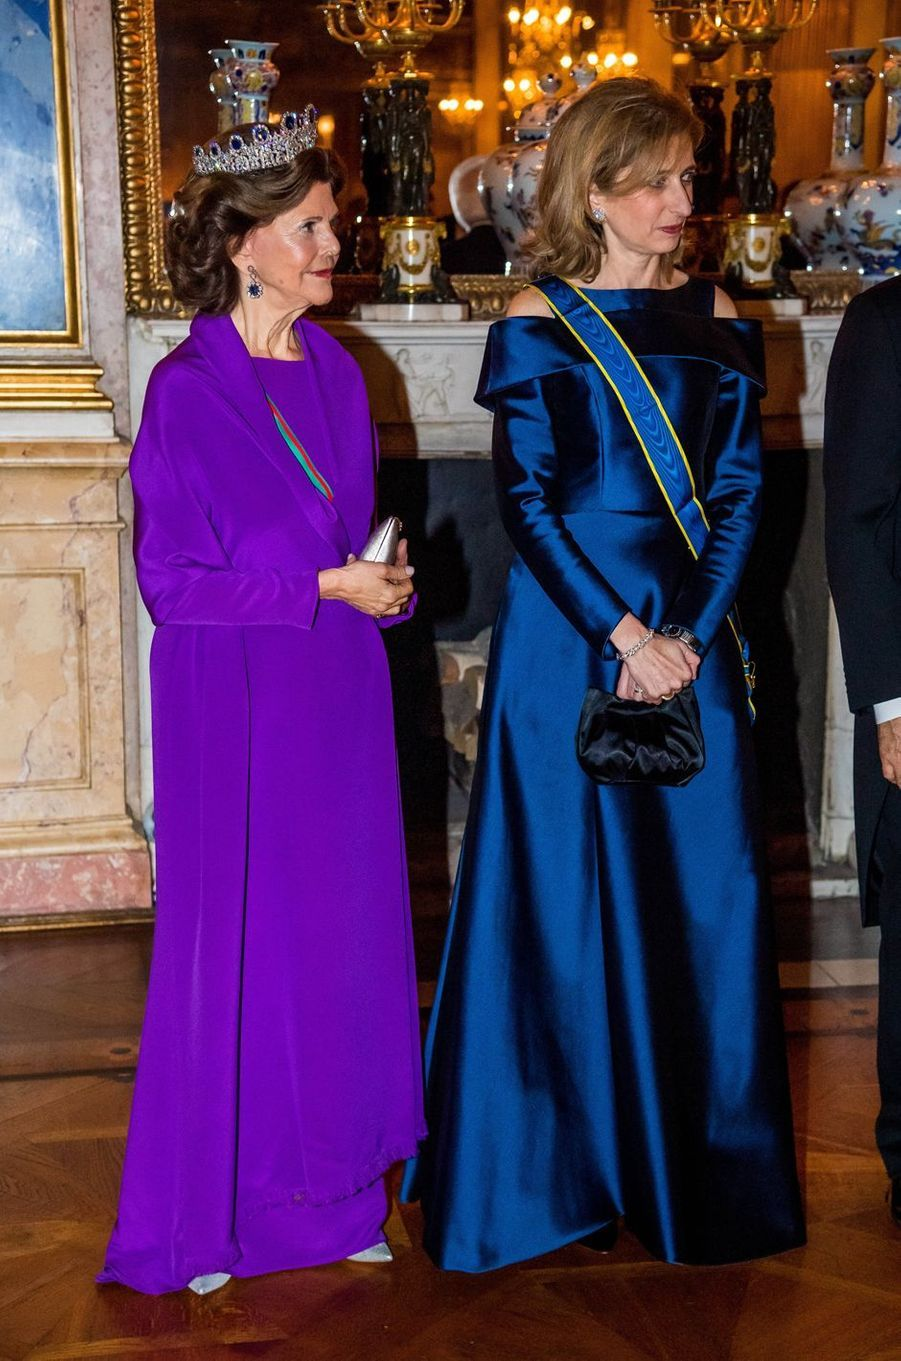 La reine Silvia de Suède et Laura Mattarella à Stockholm, le 13 novembre 2018